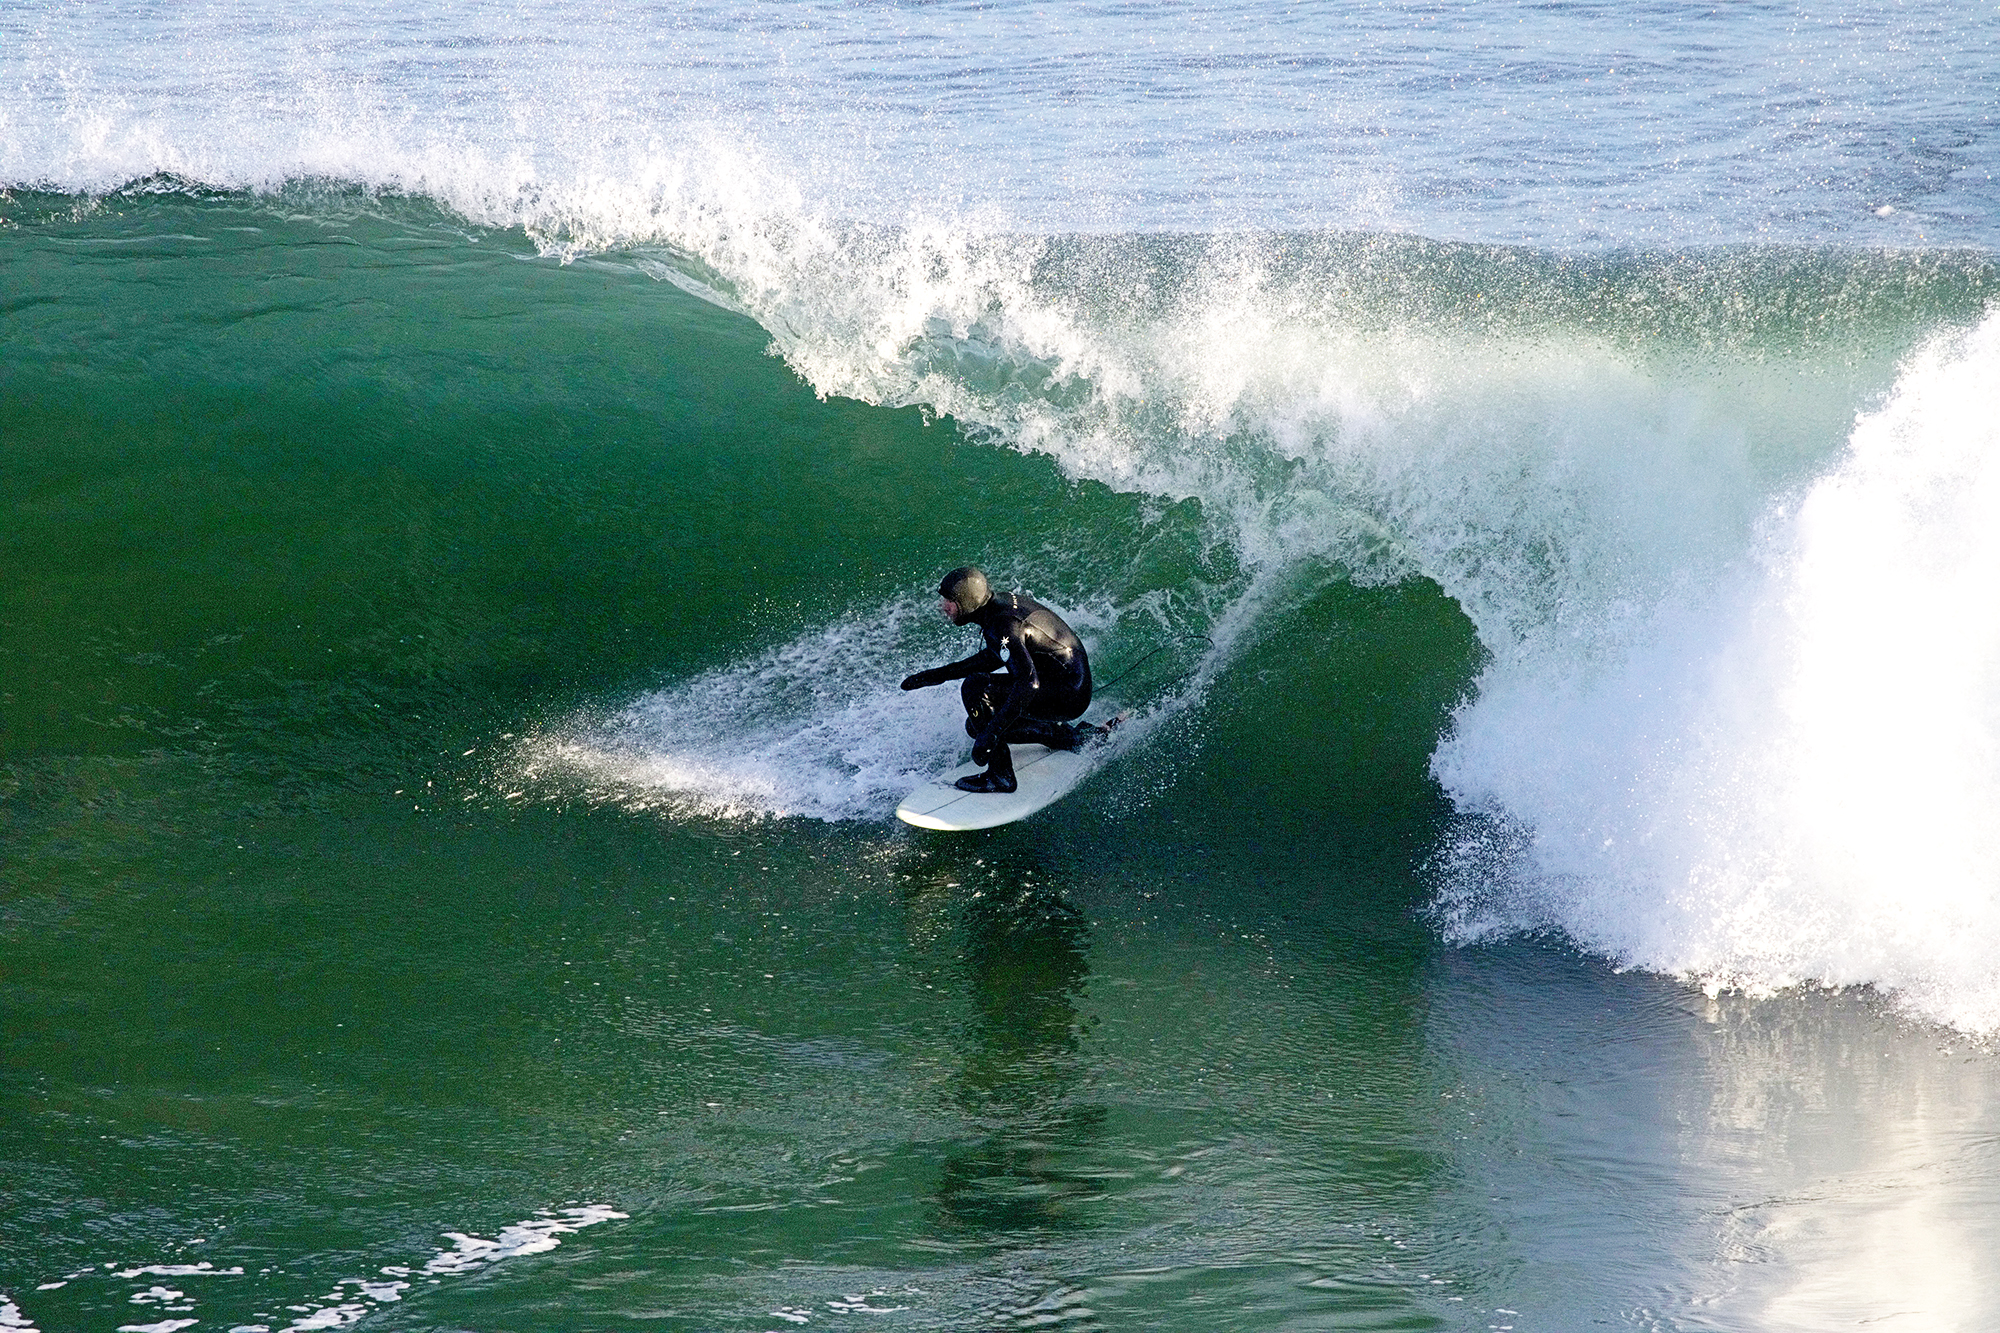 1-19-17 MTK Surfer 26.jpg